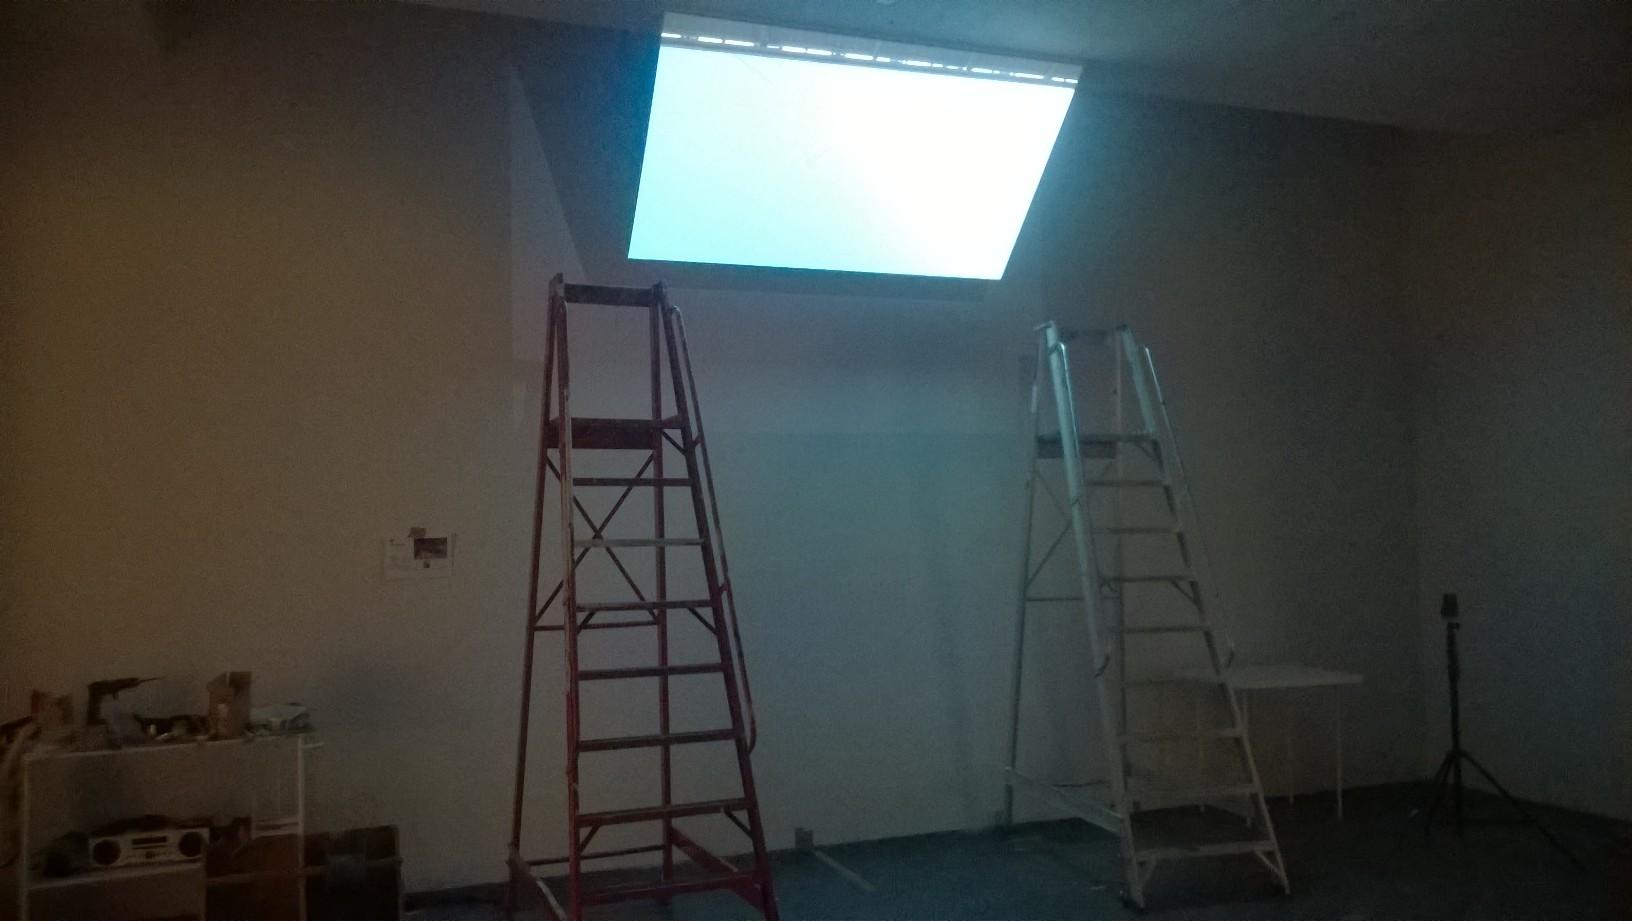 Semaphore , installation view, Kiasma Museum of contemporary art, Helsinki, January 2016